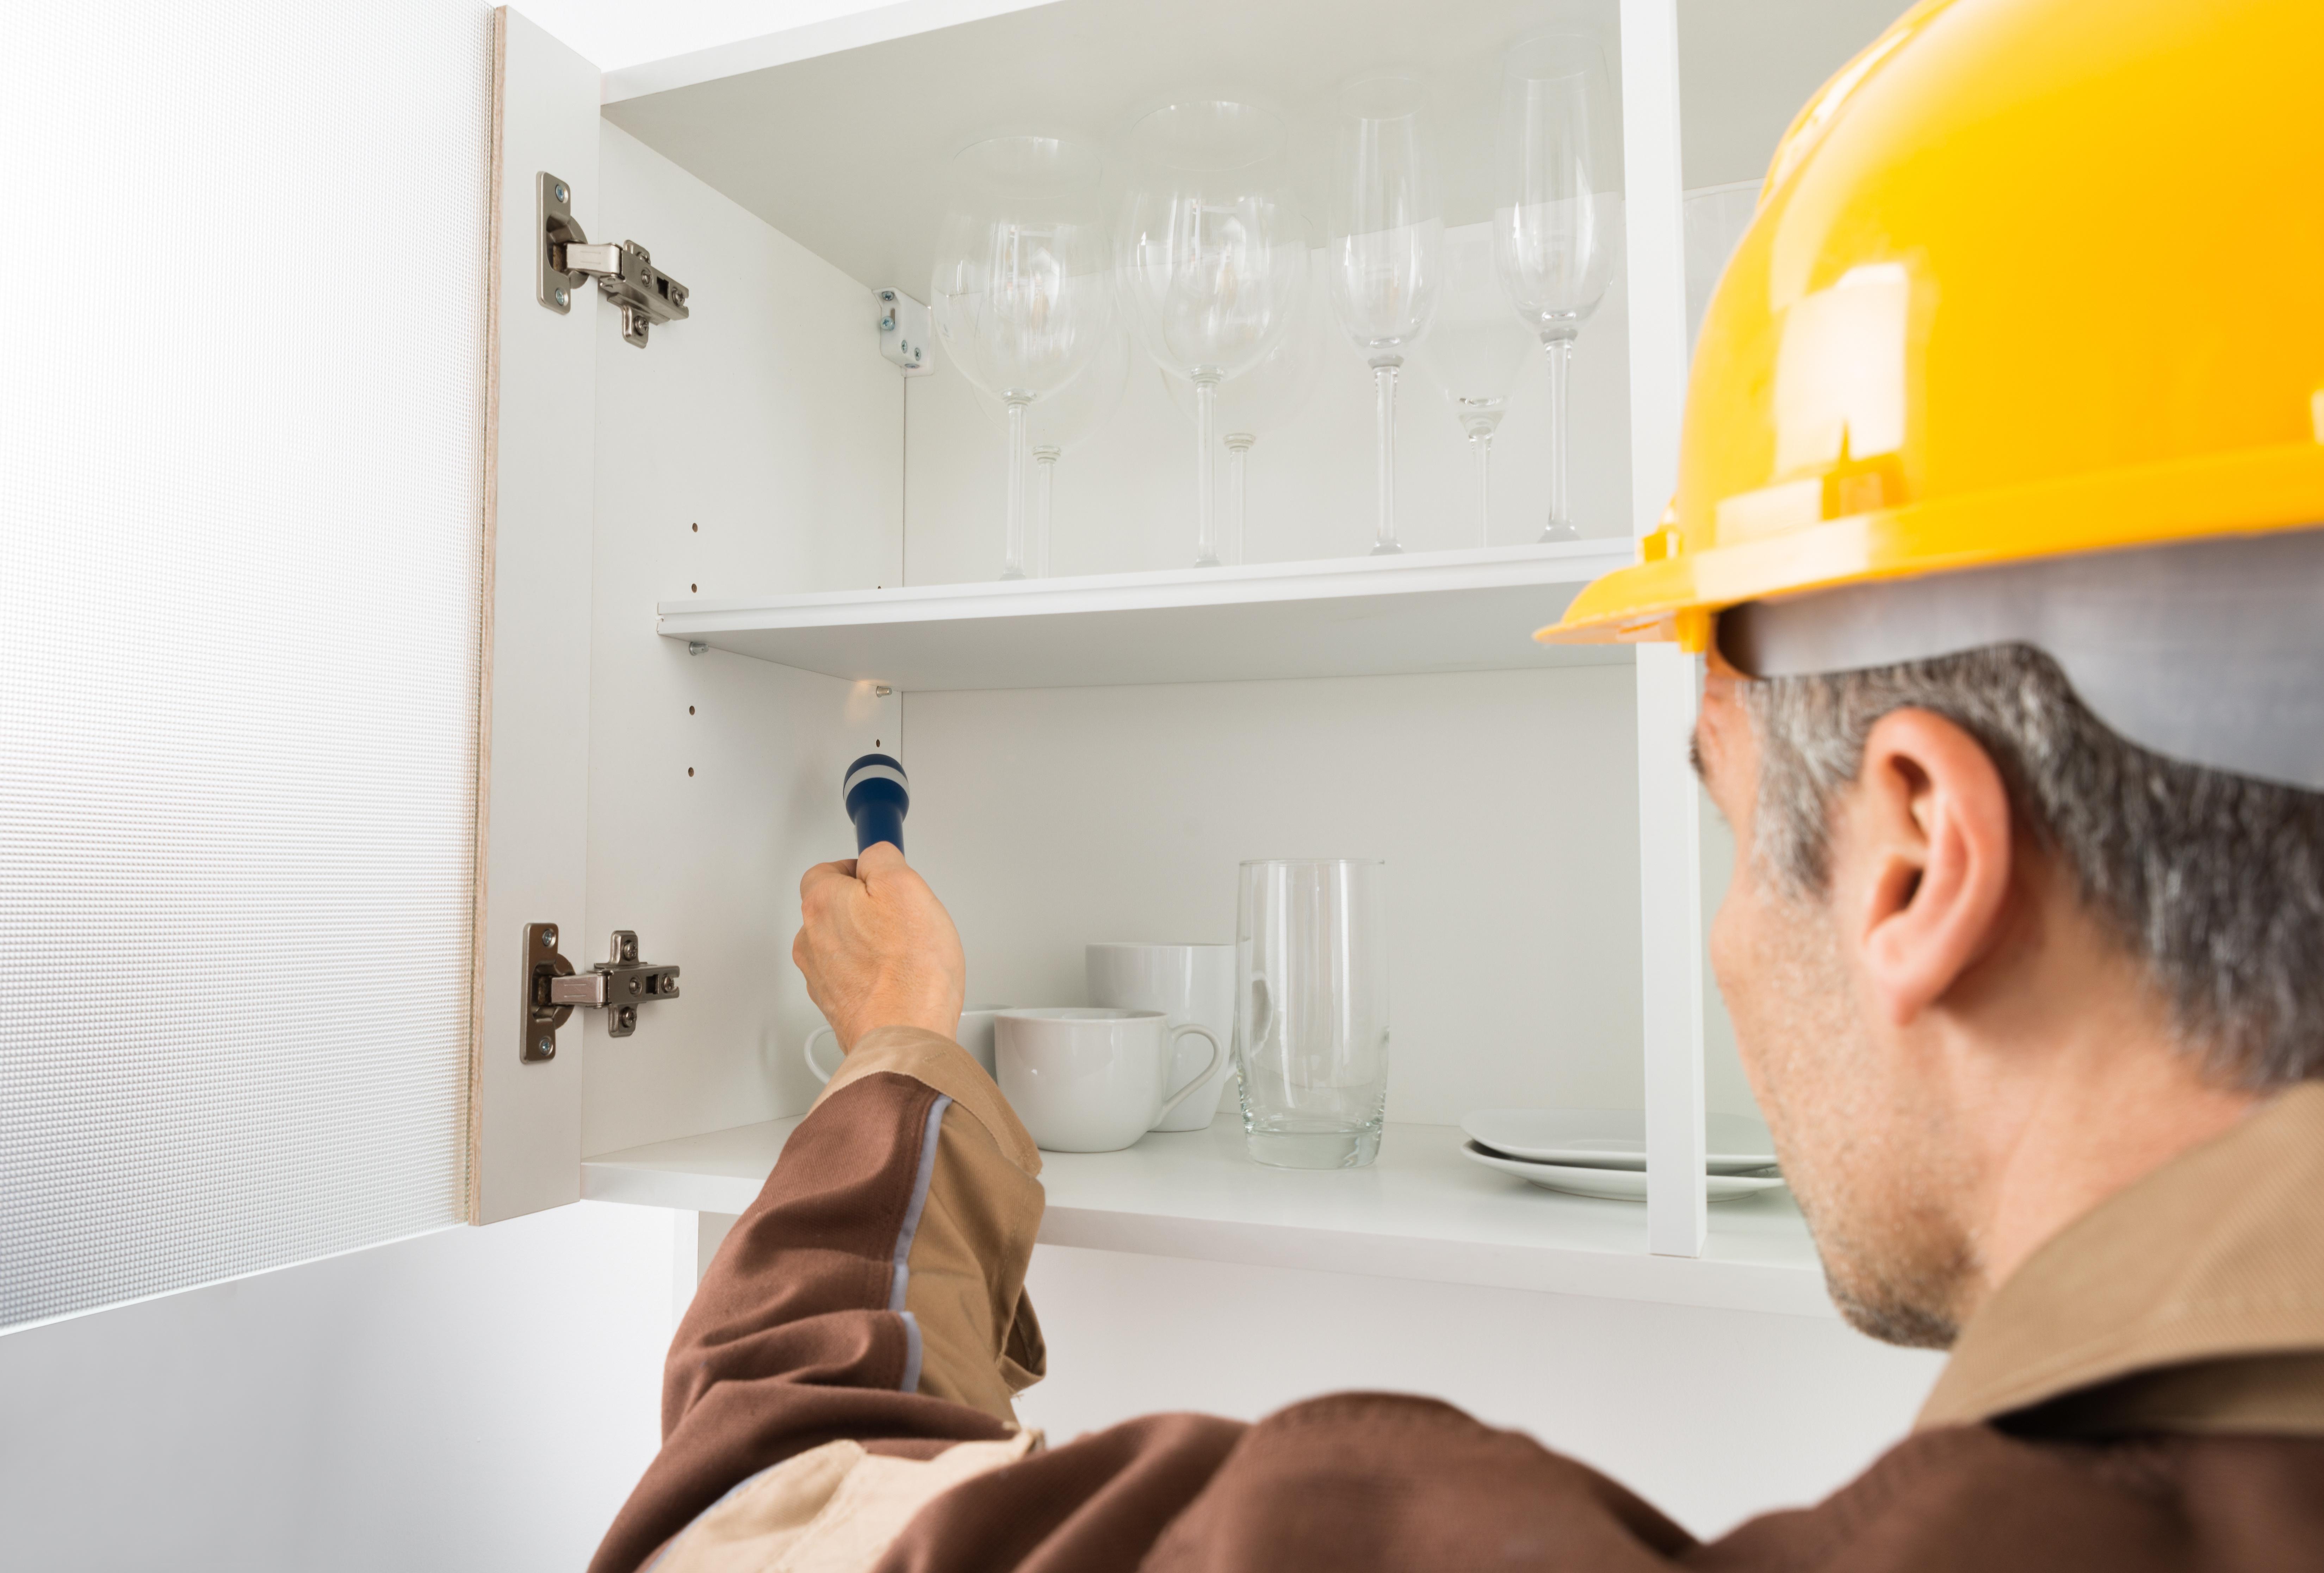 Pest Control Worker With Flashlight Checking Kitchen Shelf